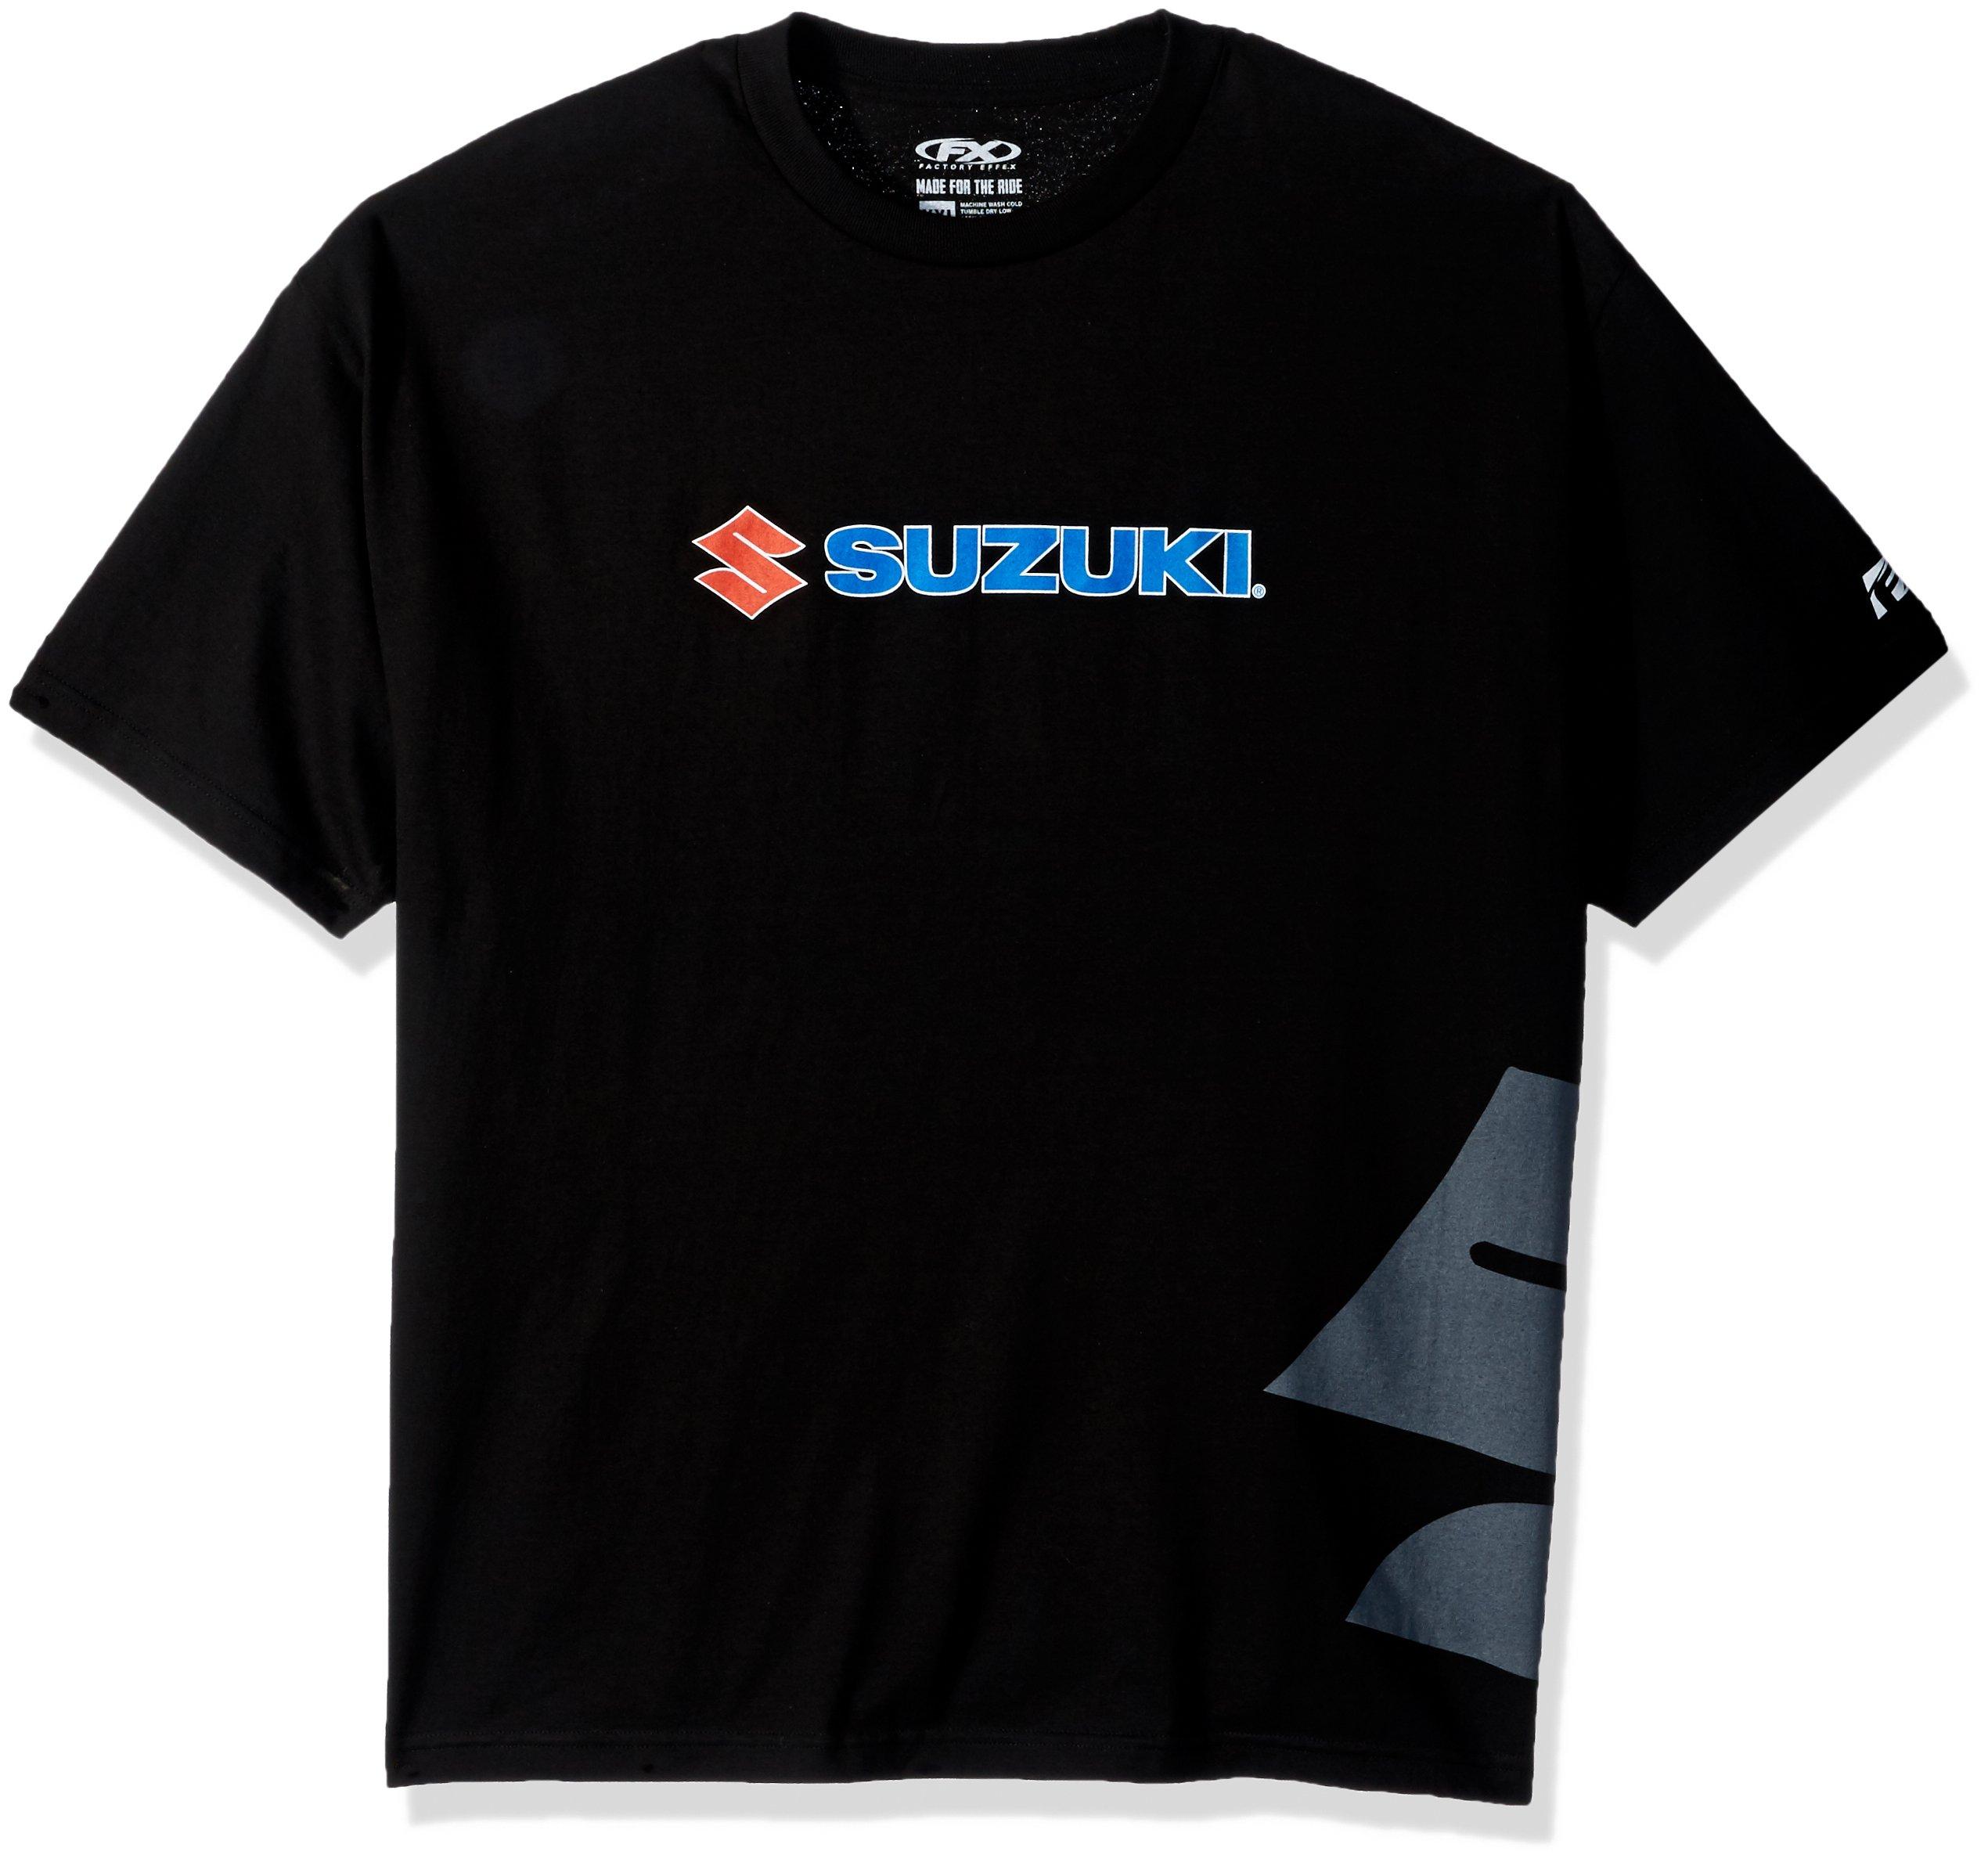 Factory Effex 15-88476 Suzuki Big 'S' T-Shirt